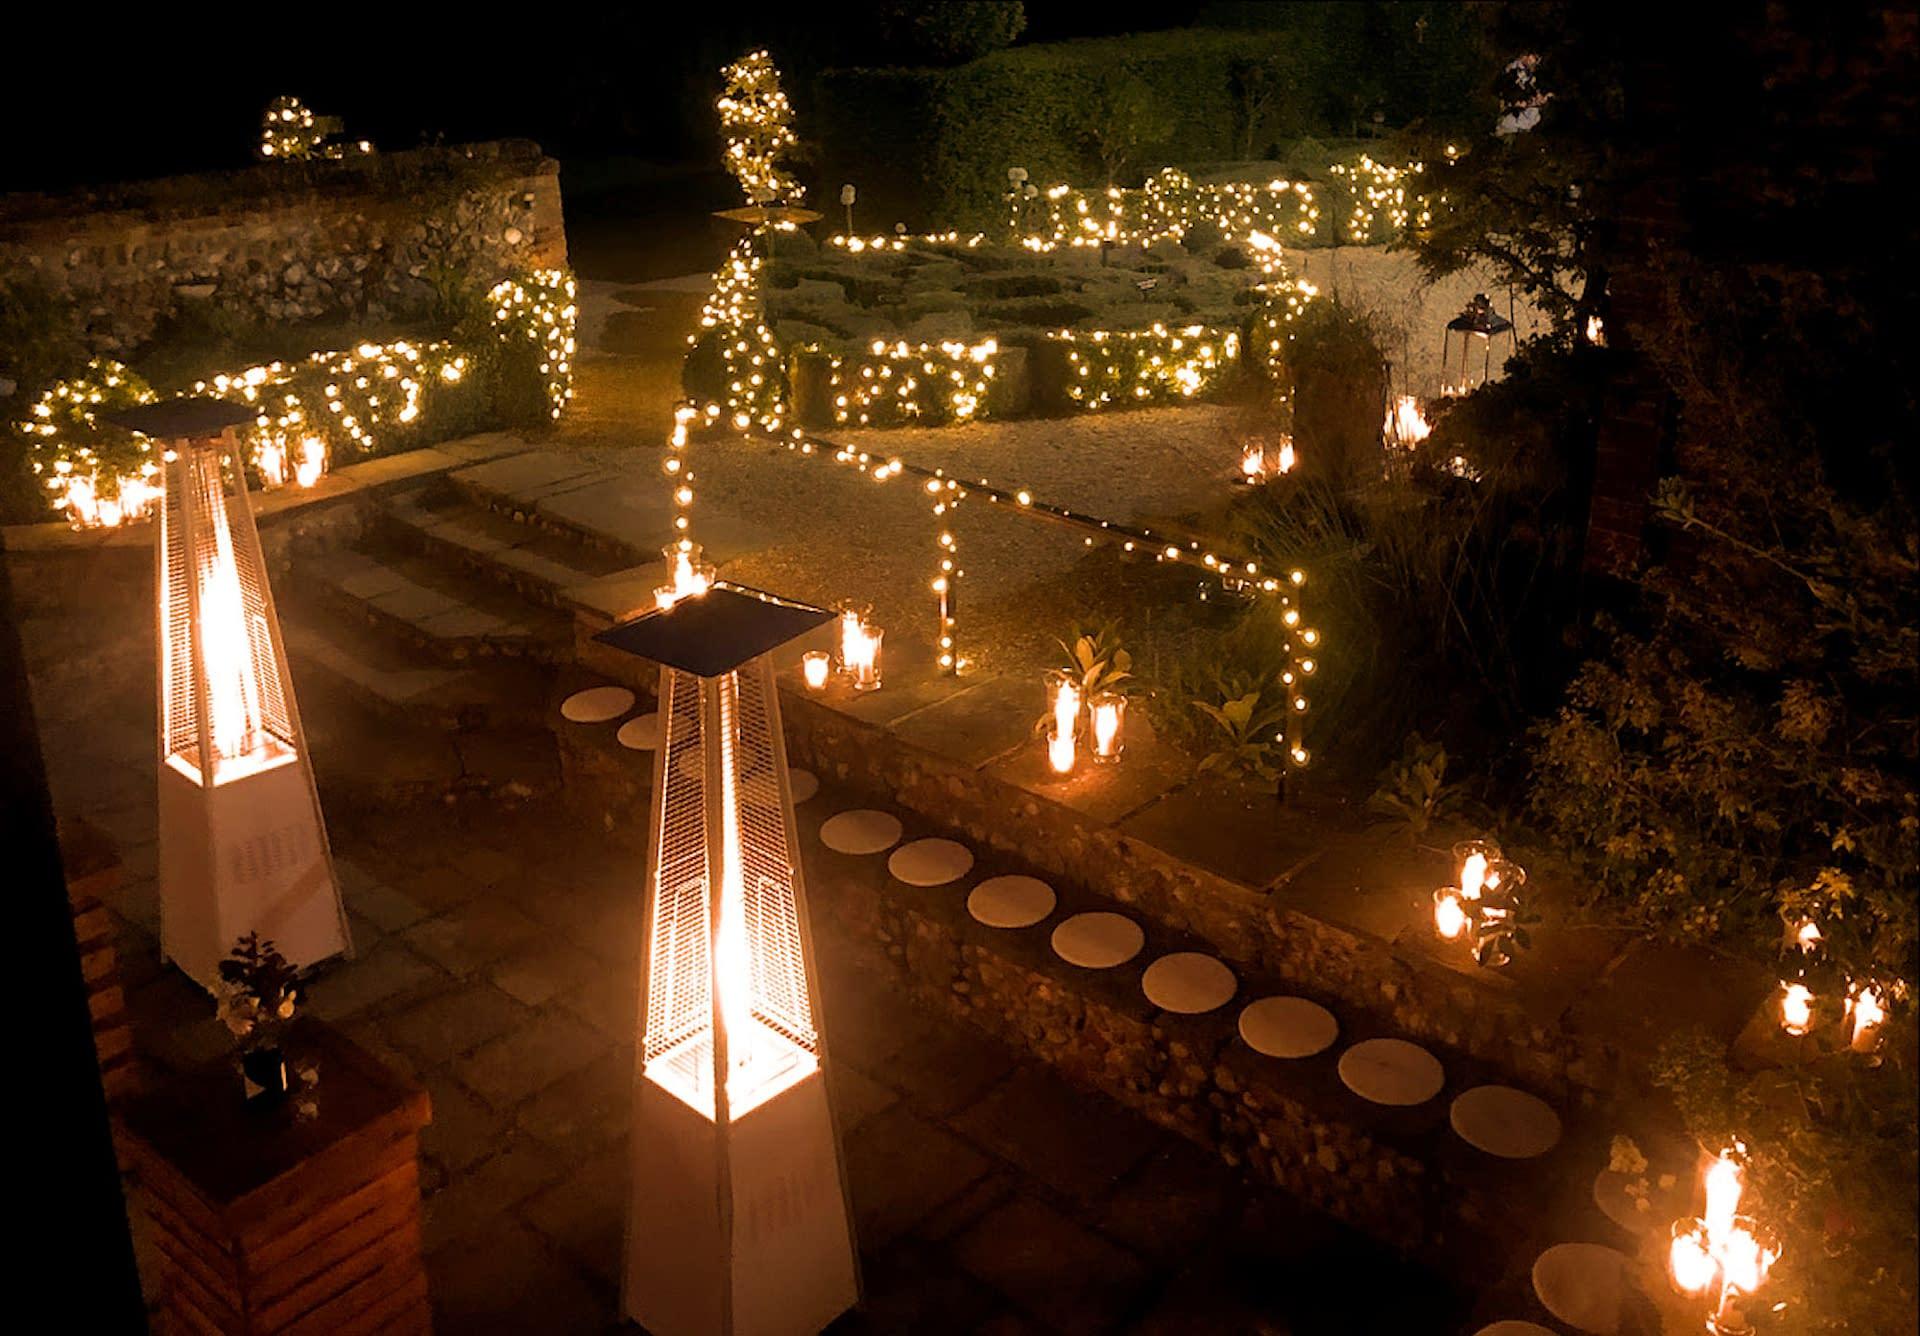 Fairy light, storm lantern and coach lantern decor plus patio heaters at Chaucer Barn, UK wedding venue